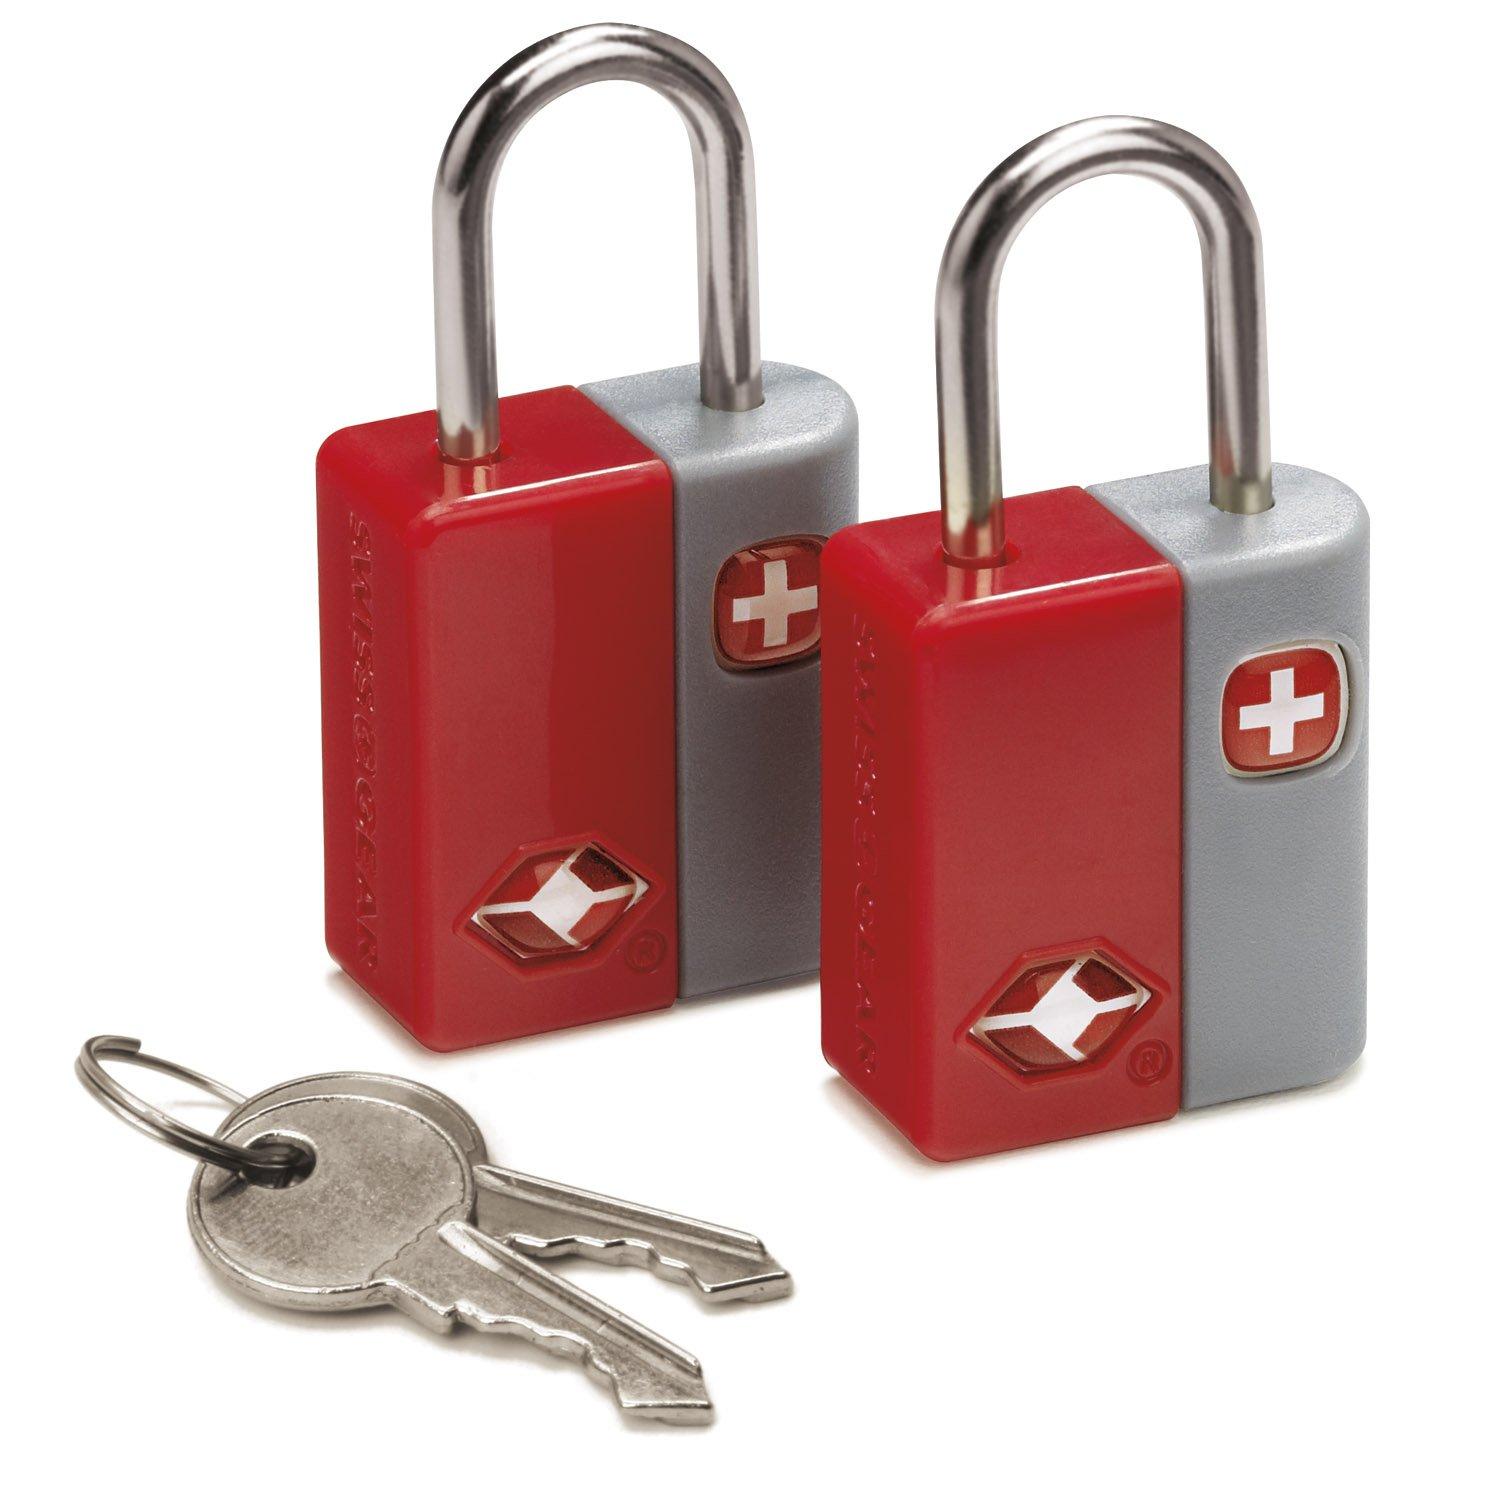 SwissGear TSA-Approved Travel Sentry Luggage Locks - Set of 2 Mini Locks with 2 Keys, Red, One Size by Swiss Gear (Image #1)